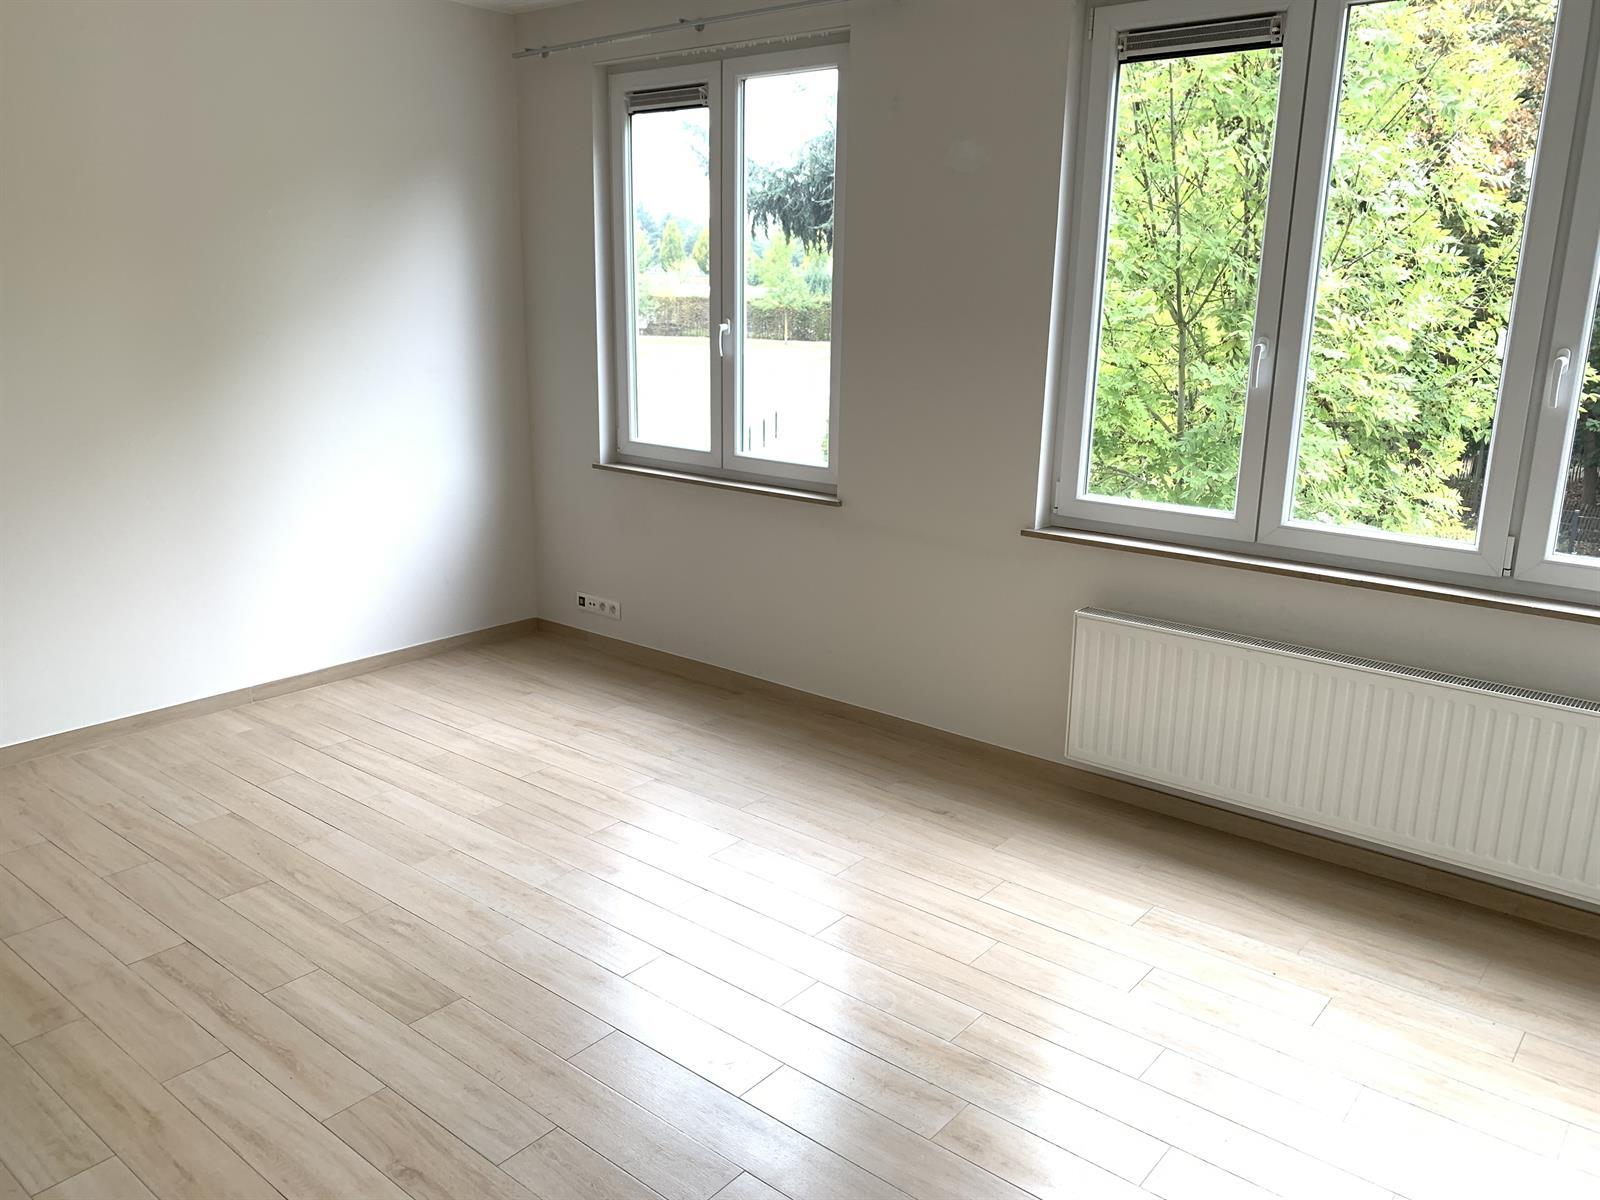 Appartement - Molenbeek-Saint-Jean - #4199507-2